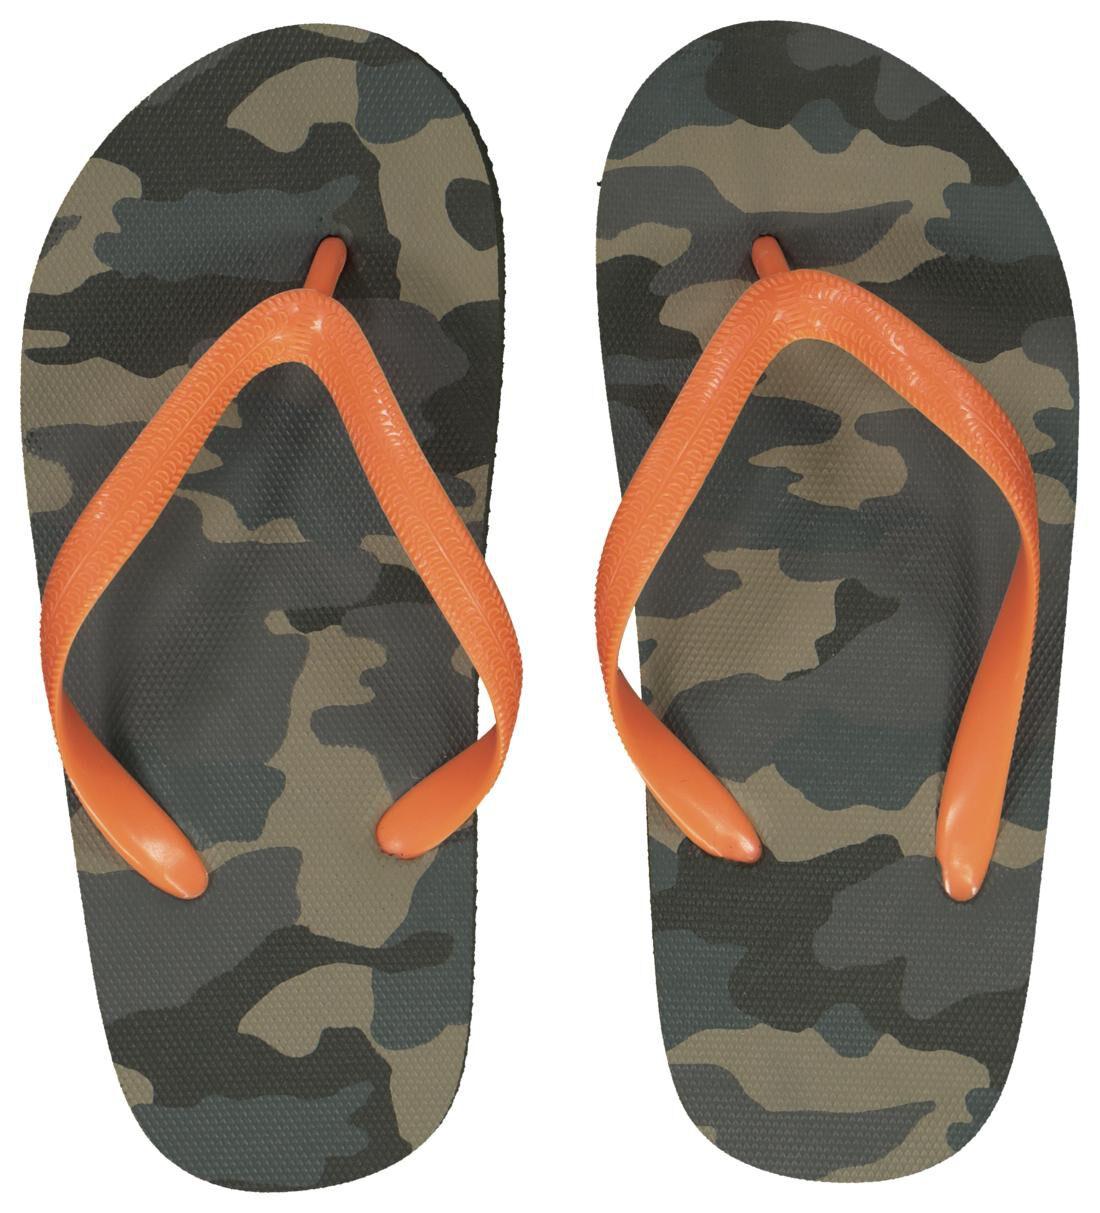 HEMA Kinder Teenslippers Camouflage Donkergroen (donkergroen)